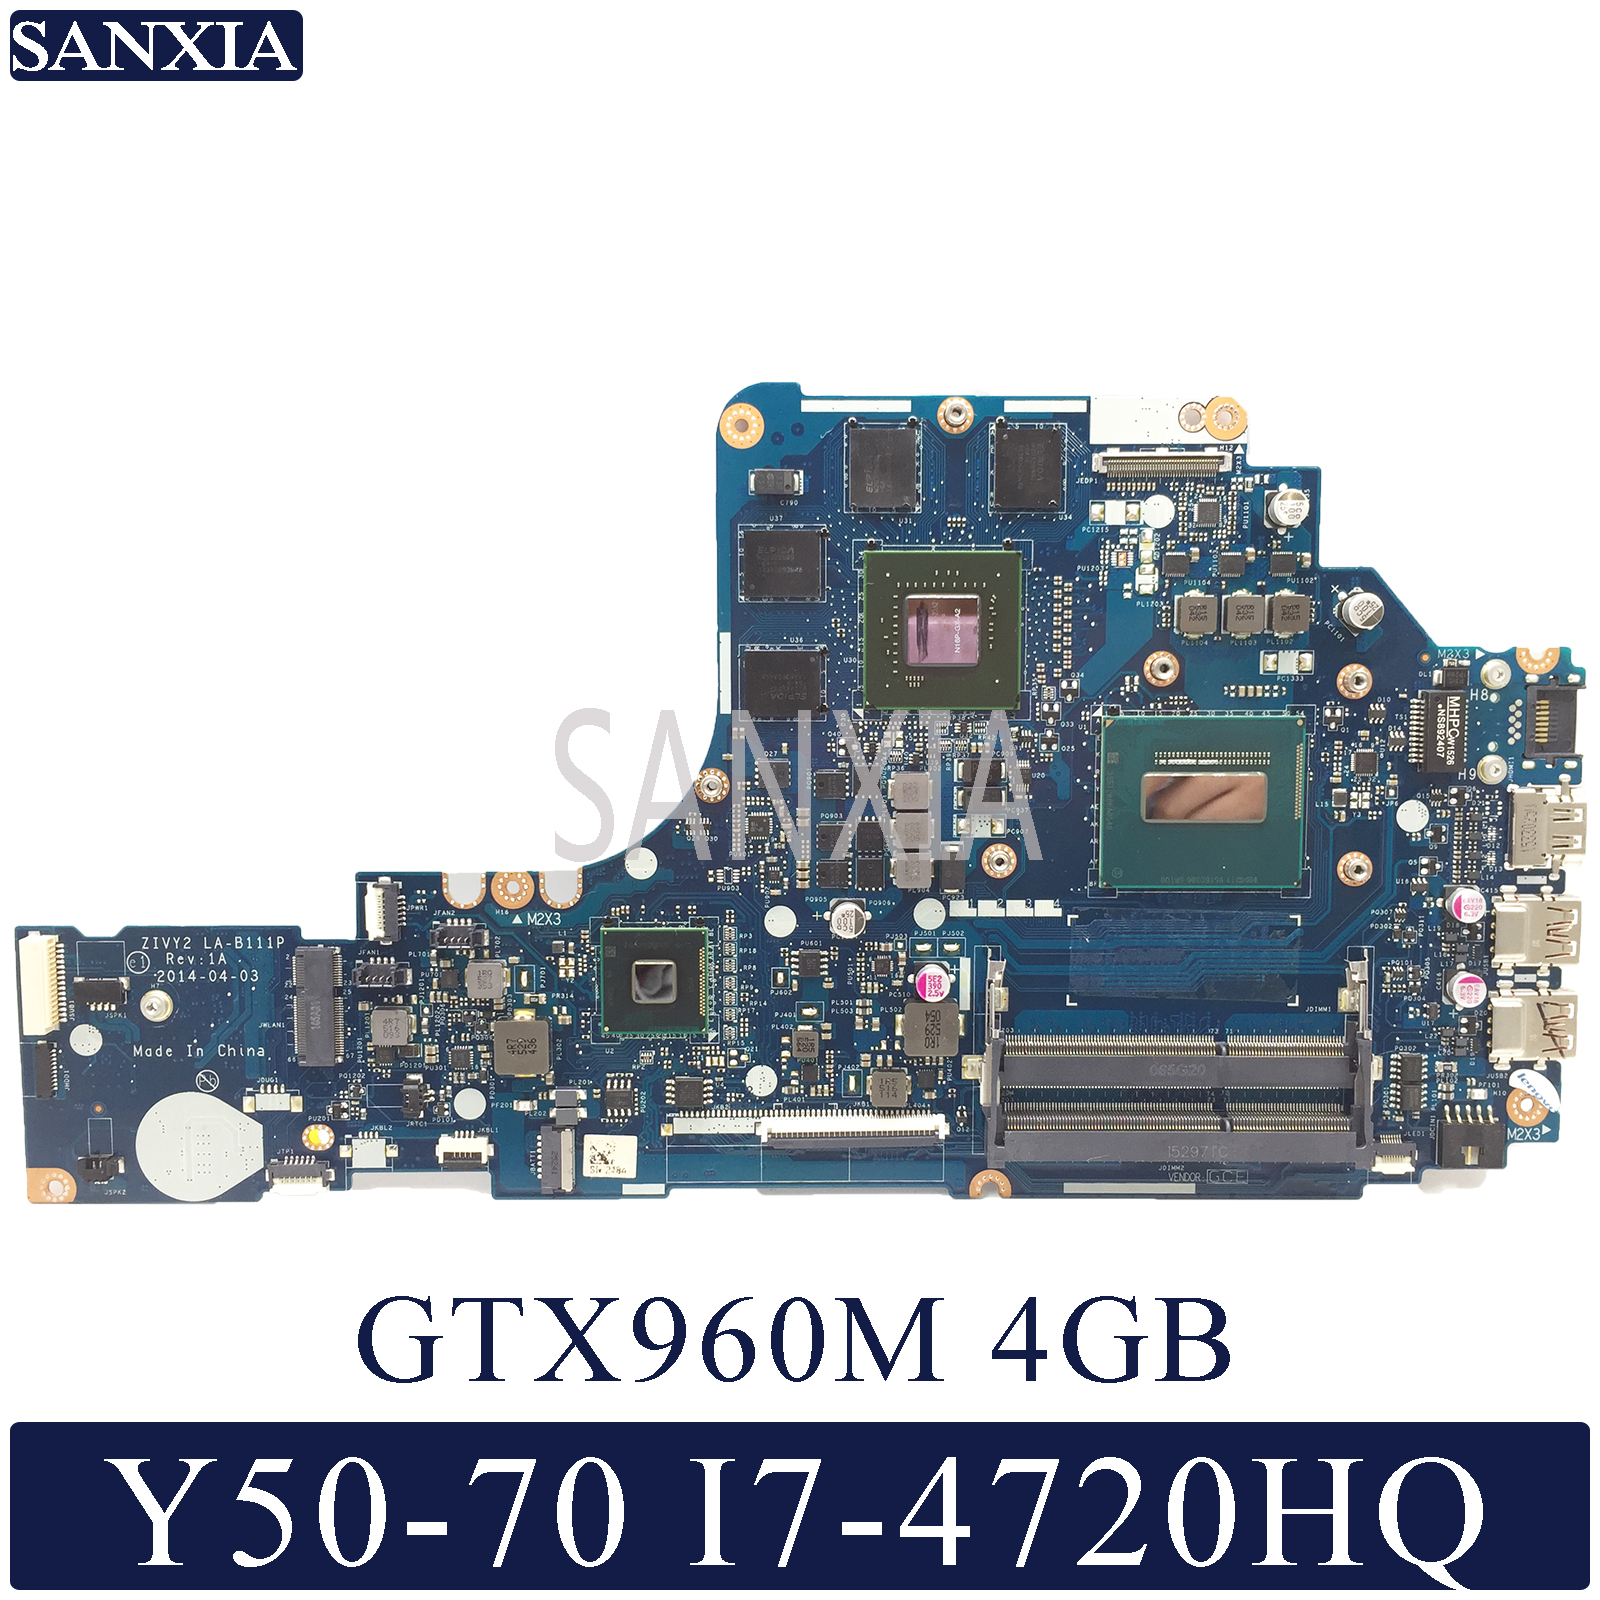 KEFU LA-B111P Laptop Motherboard For Lenovo Y50-70 Original Mainboard I7-4720HQ/4710HQ GTX960M-4GB